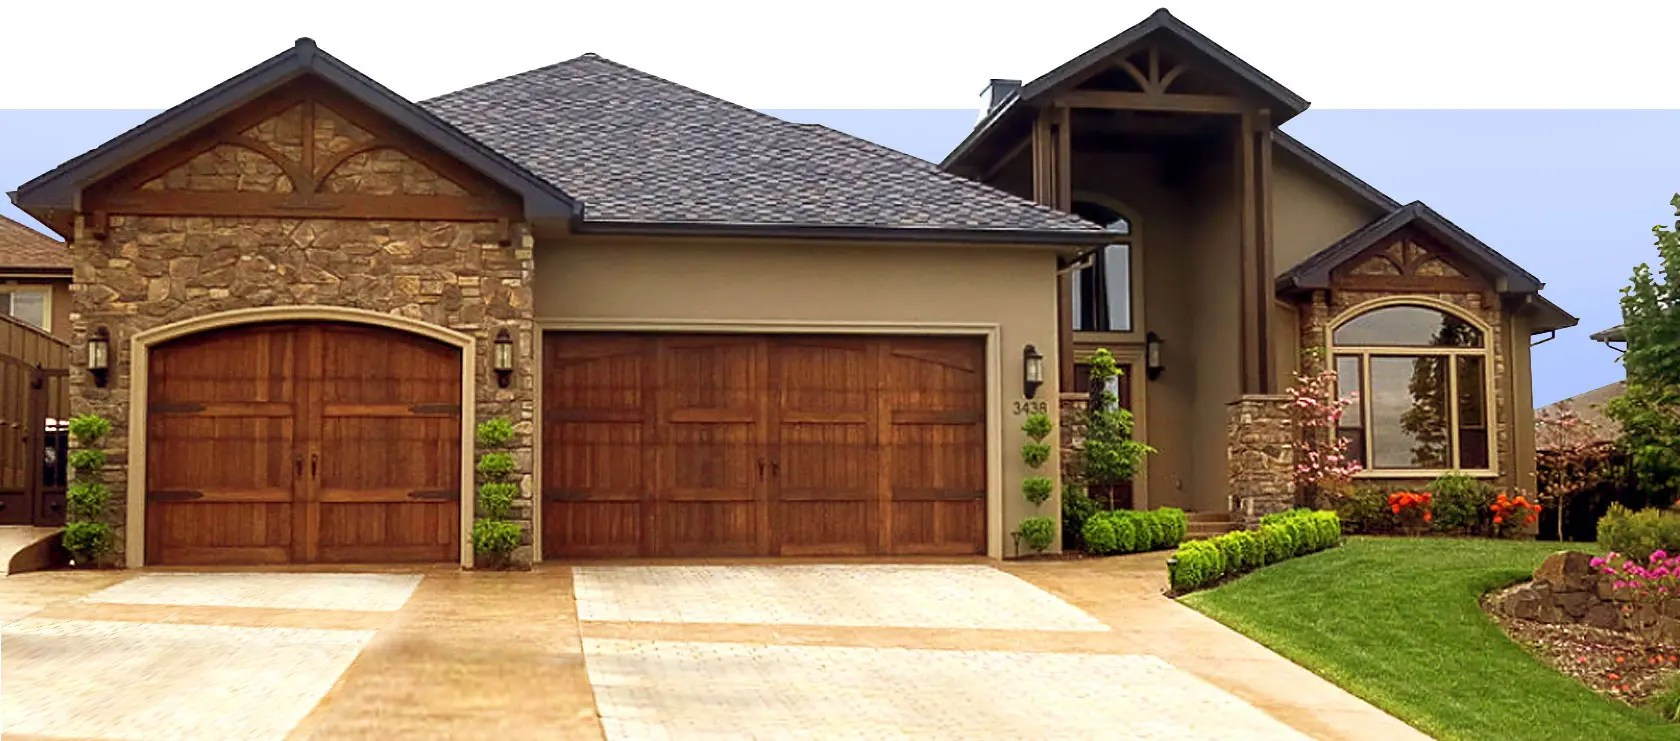 American Eagle Garage Doors Llc Best Eagle 2018